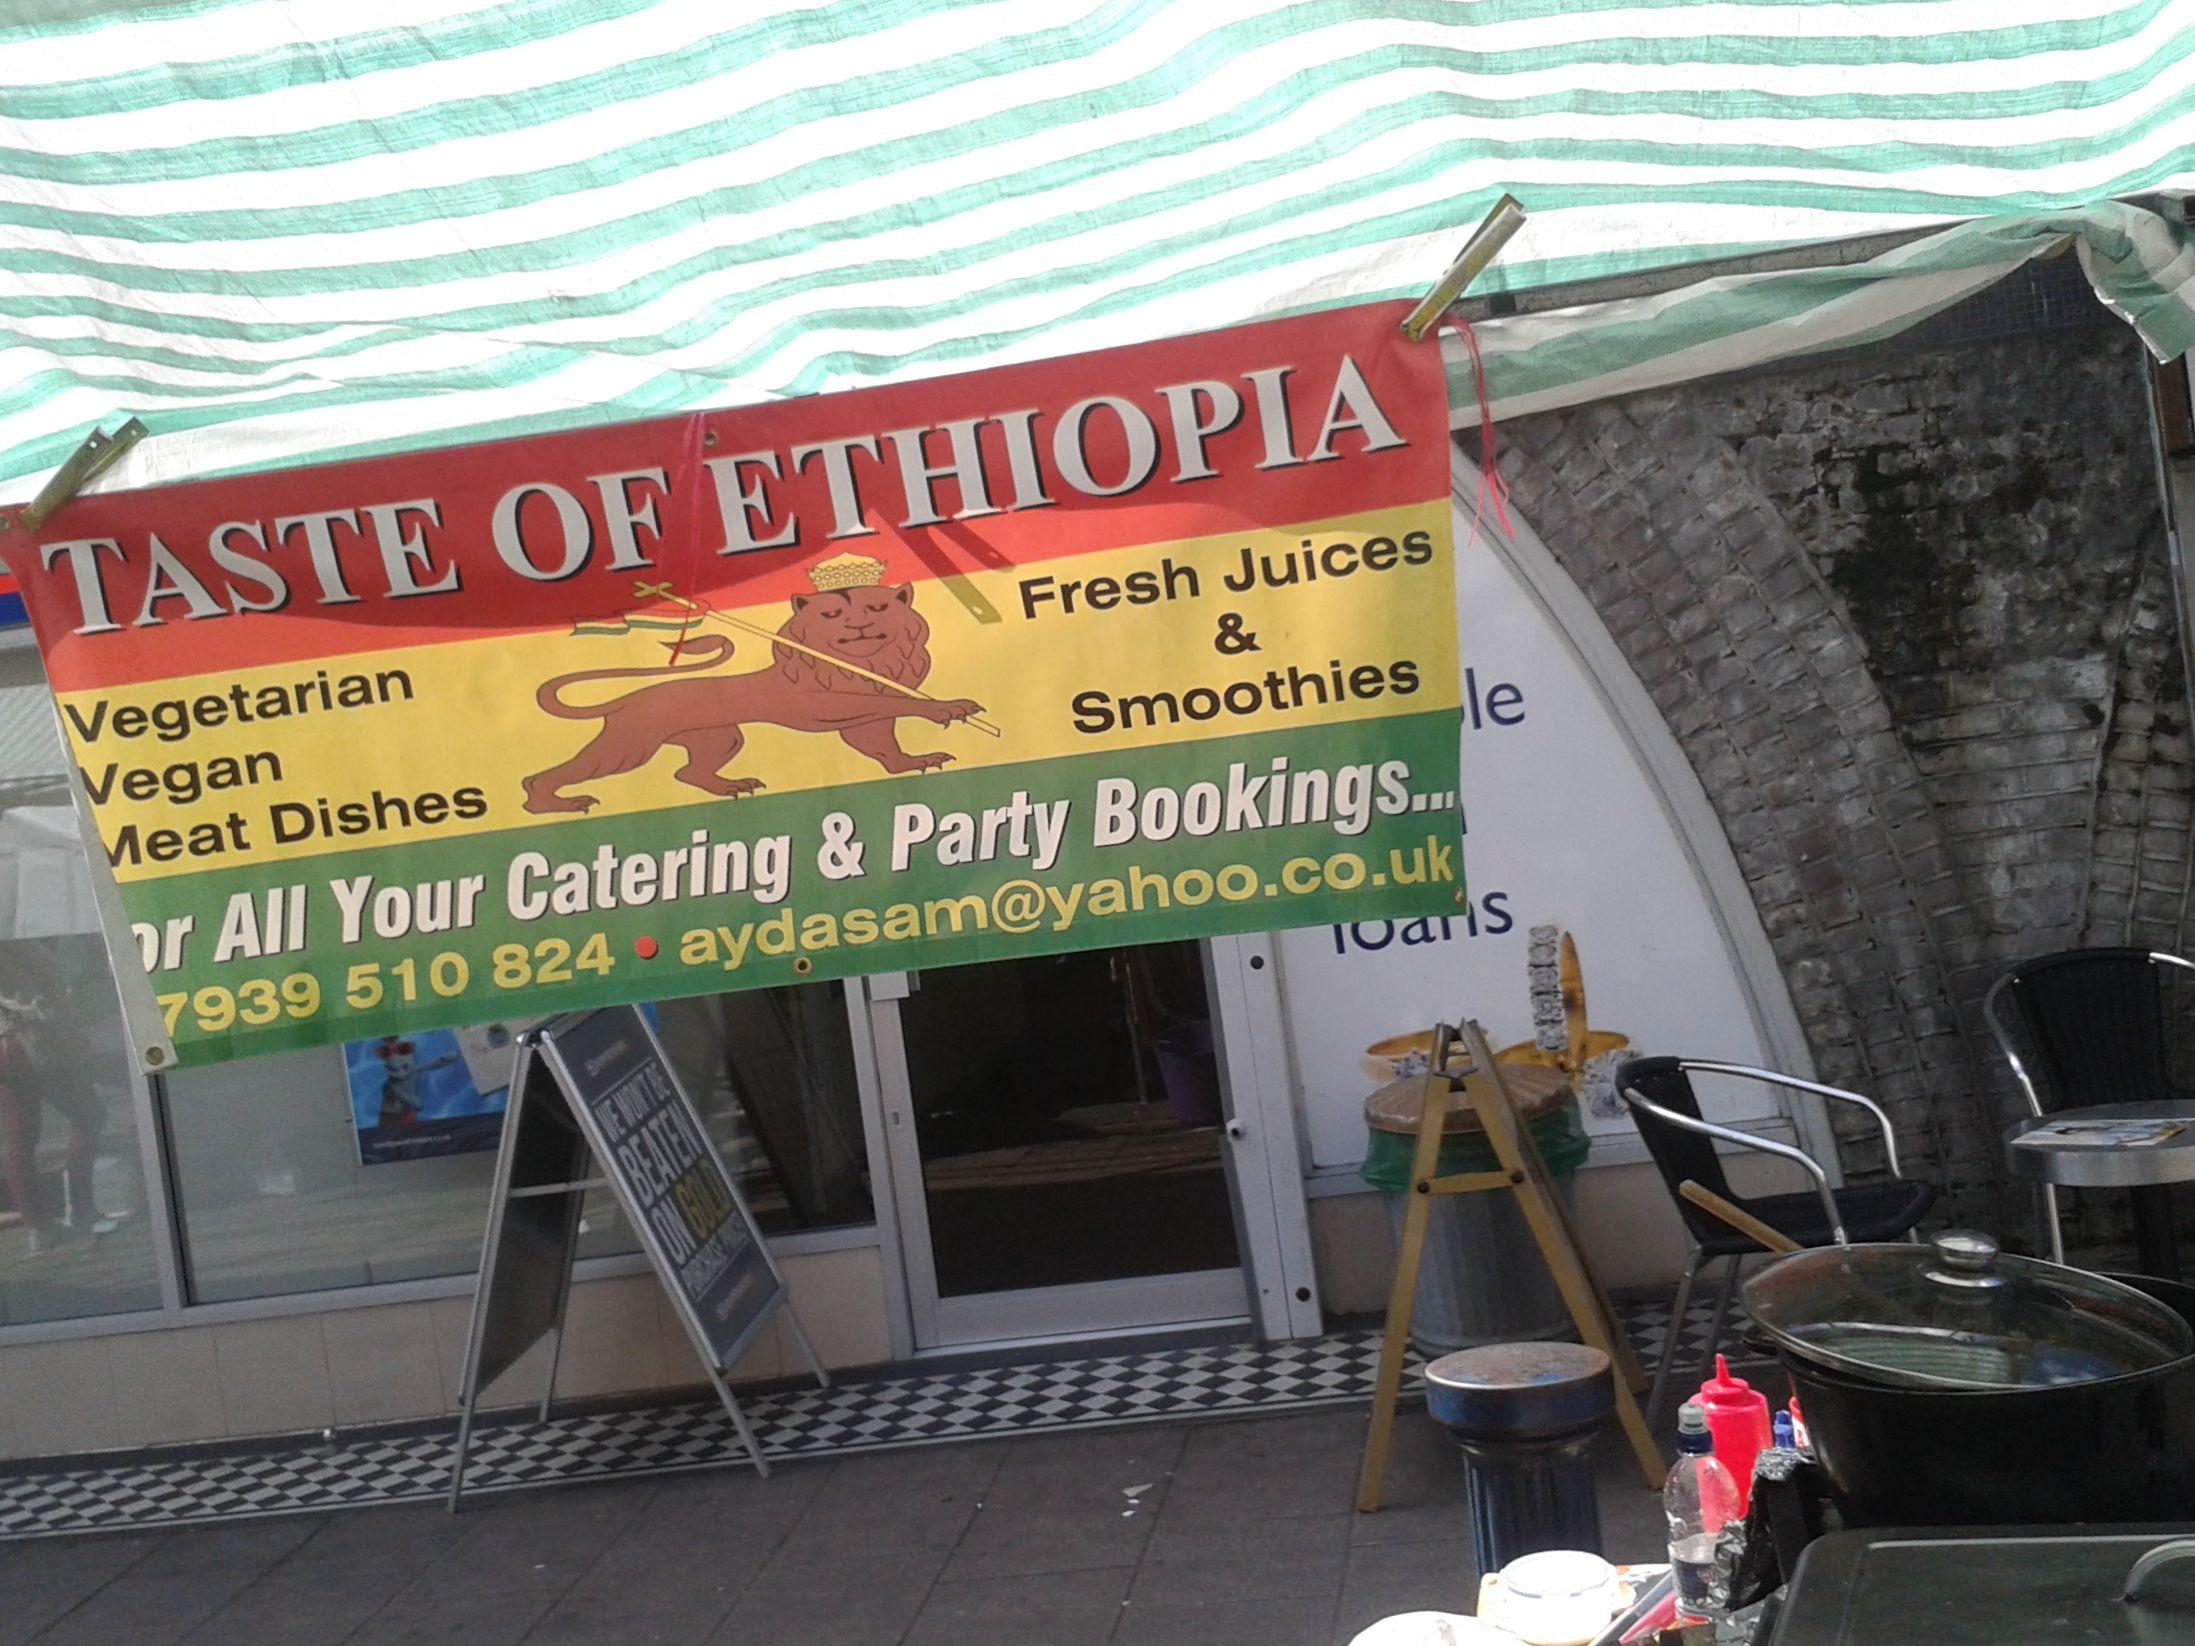 https://i0.wp.com/fatgayvegan.com/wp-content/uploads/2013/08/ethiopia.jpg?fit=2195%2C1646